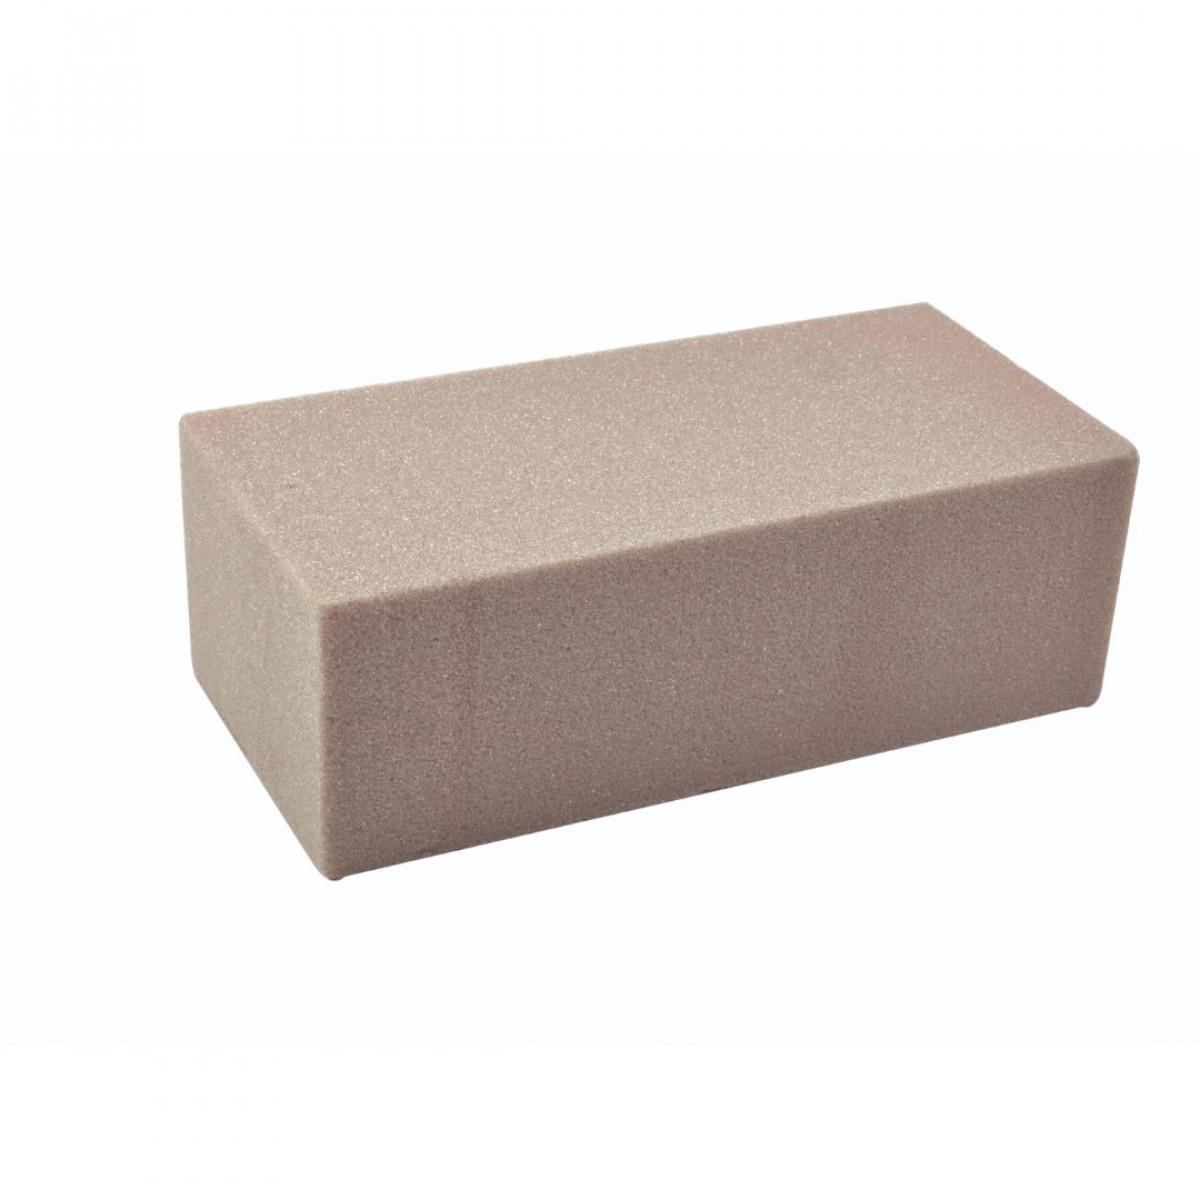 SEC Brick (2 Nos) Dry Oasis Floral Foam